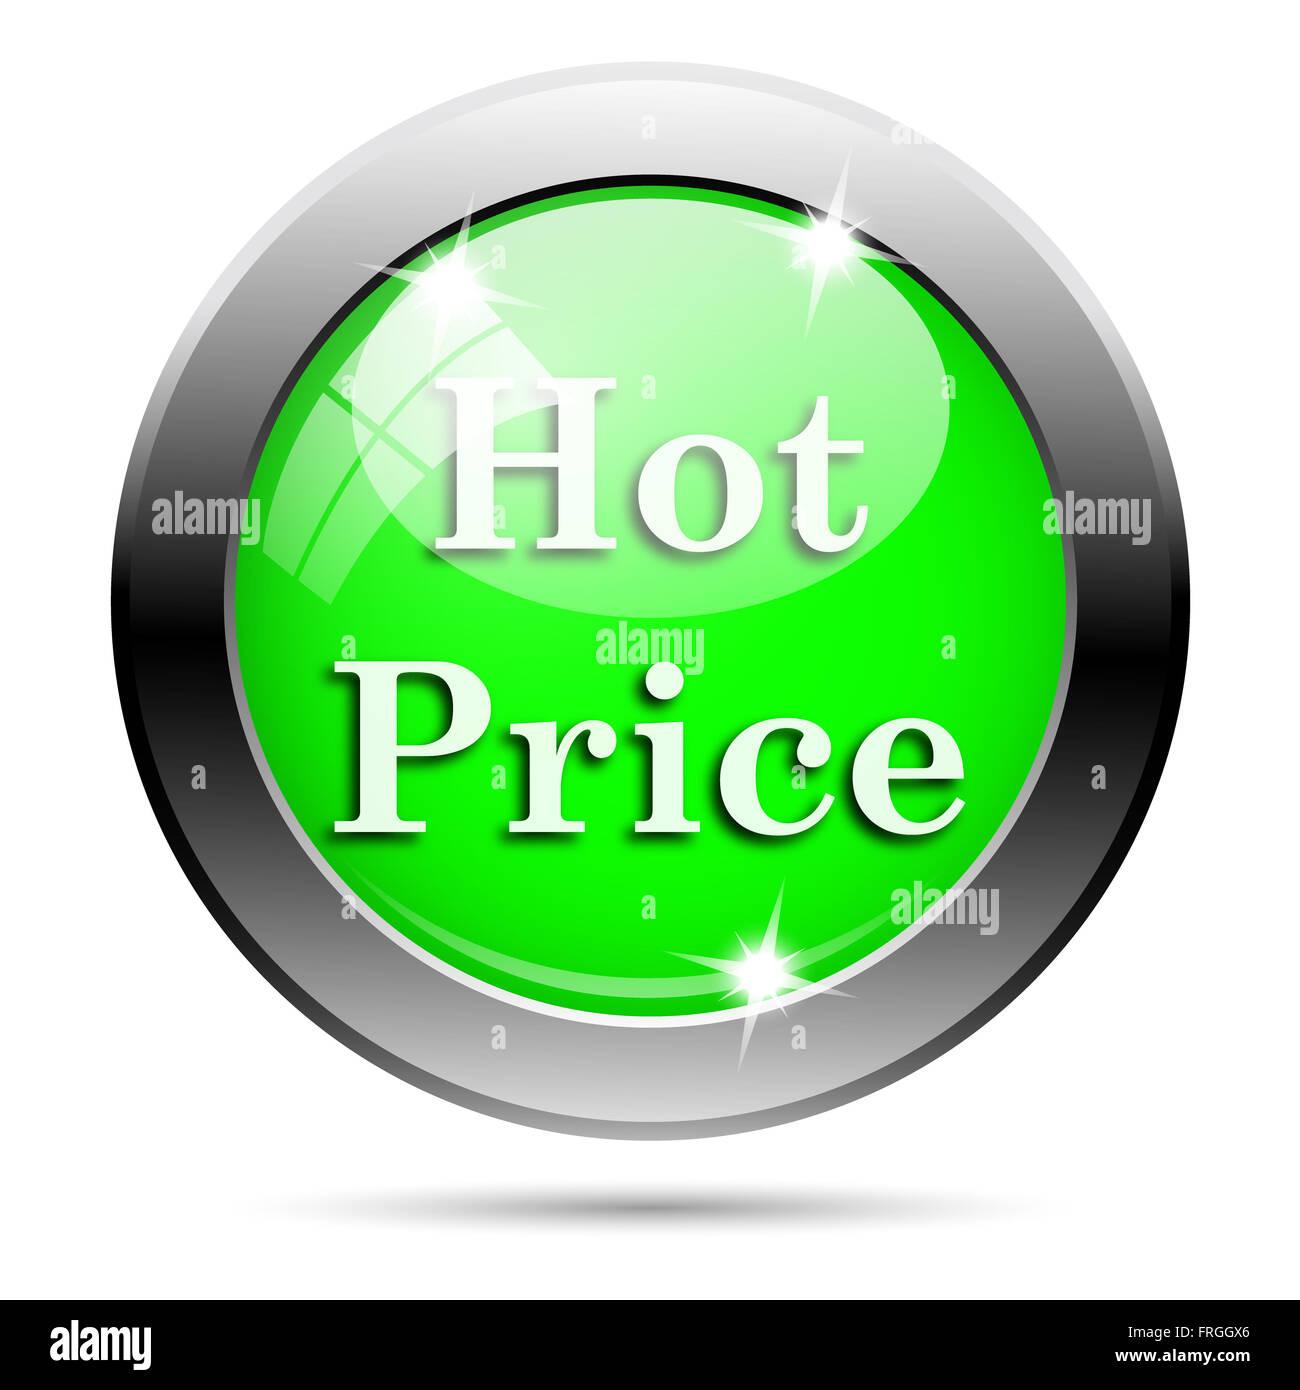 Metallic round glossy icon with white design on green background Stock Photo